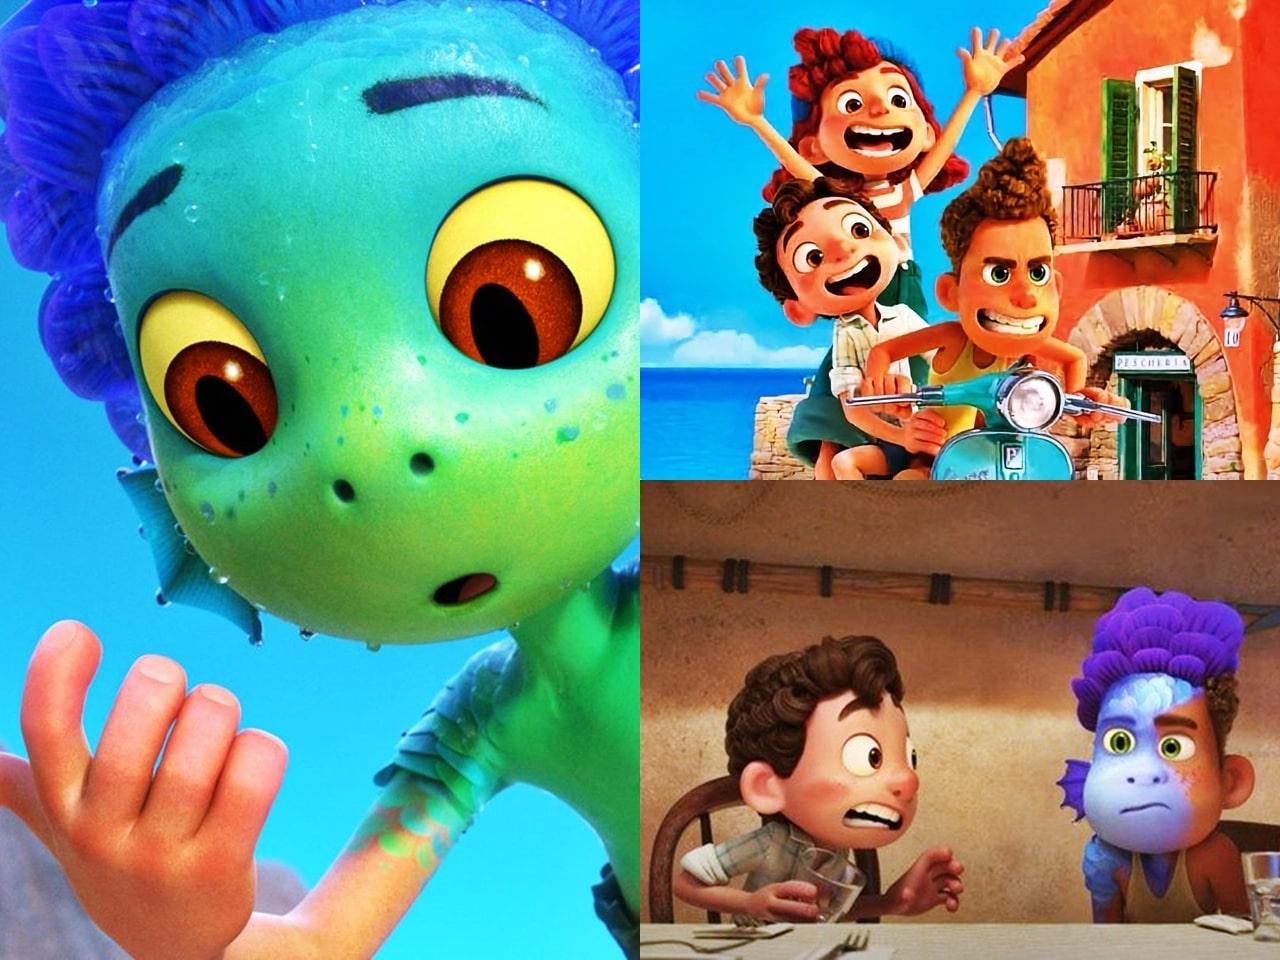 Review Filem : Luca (2021), Filem Pixar Terbaru 2021